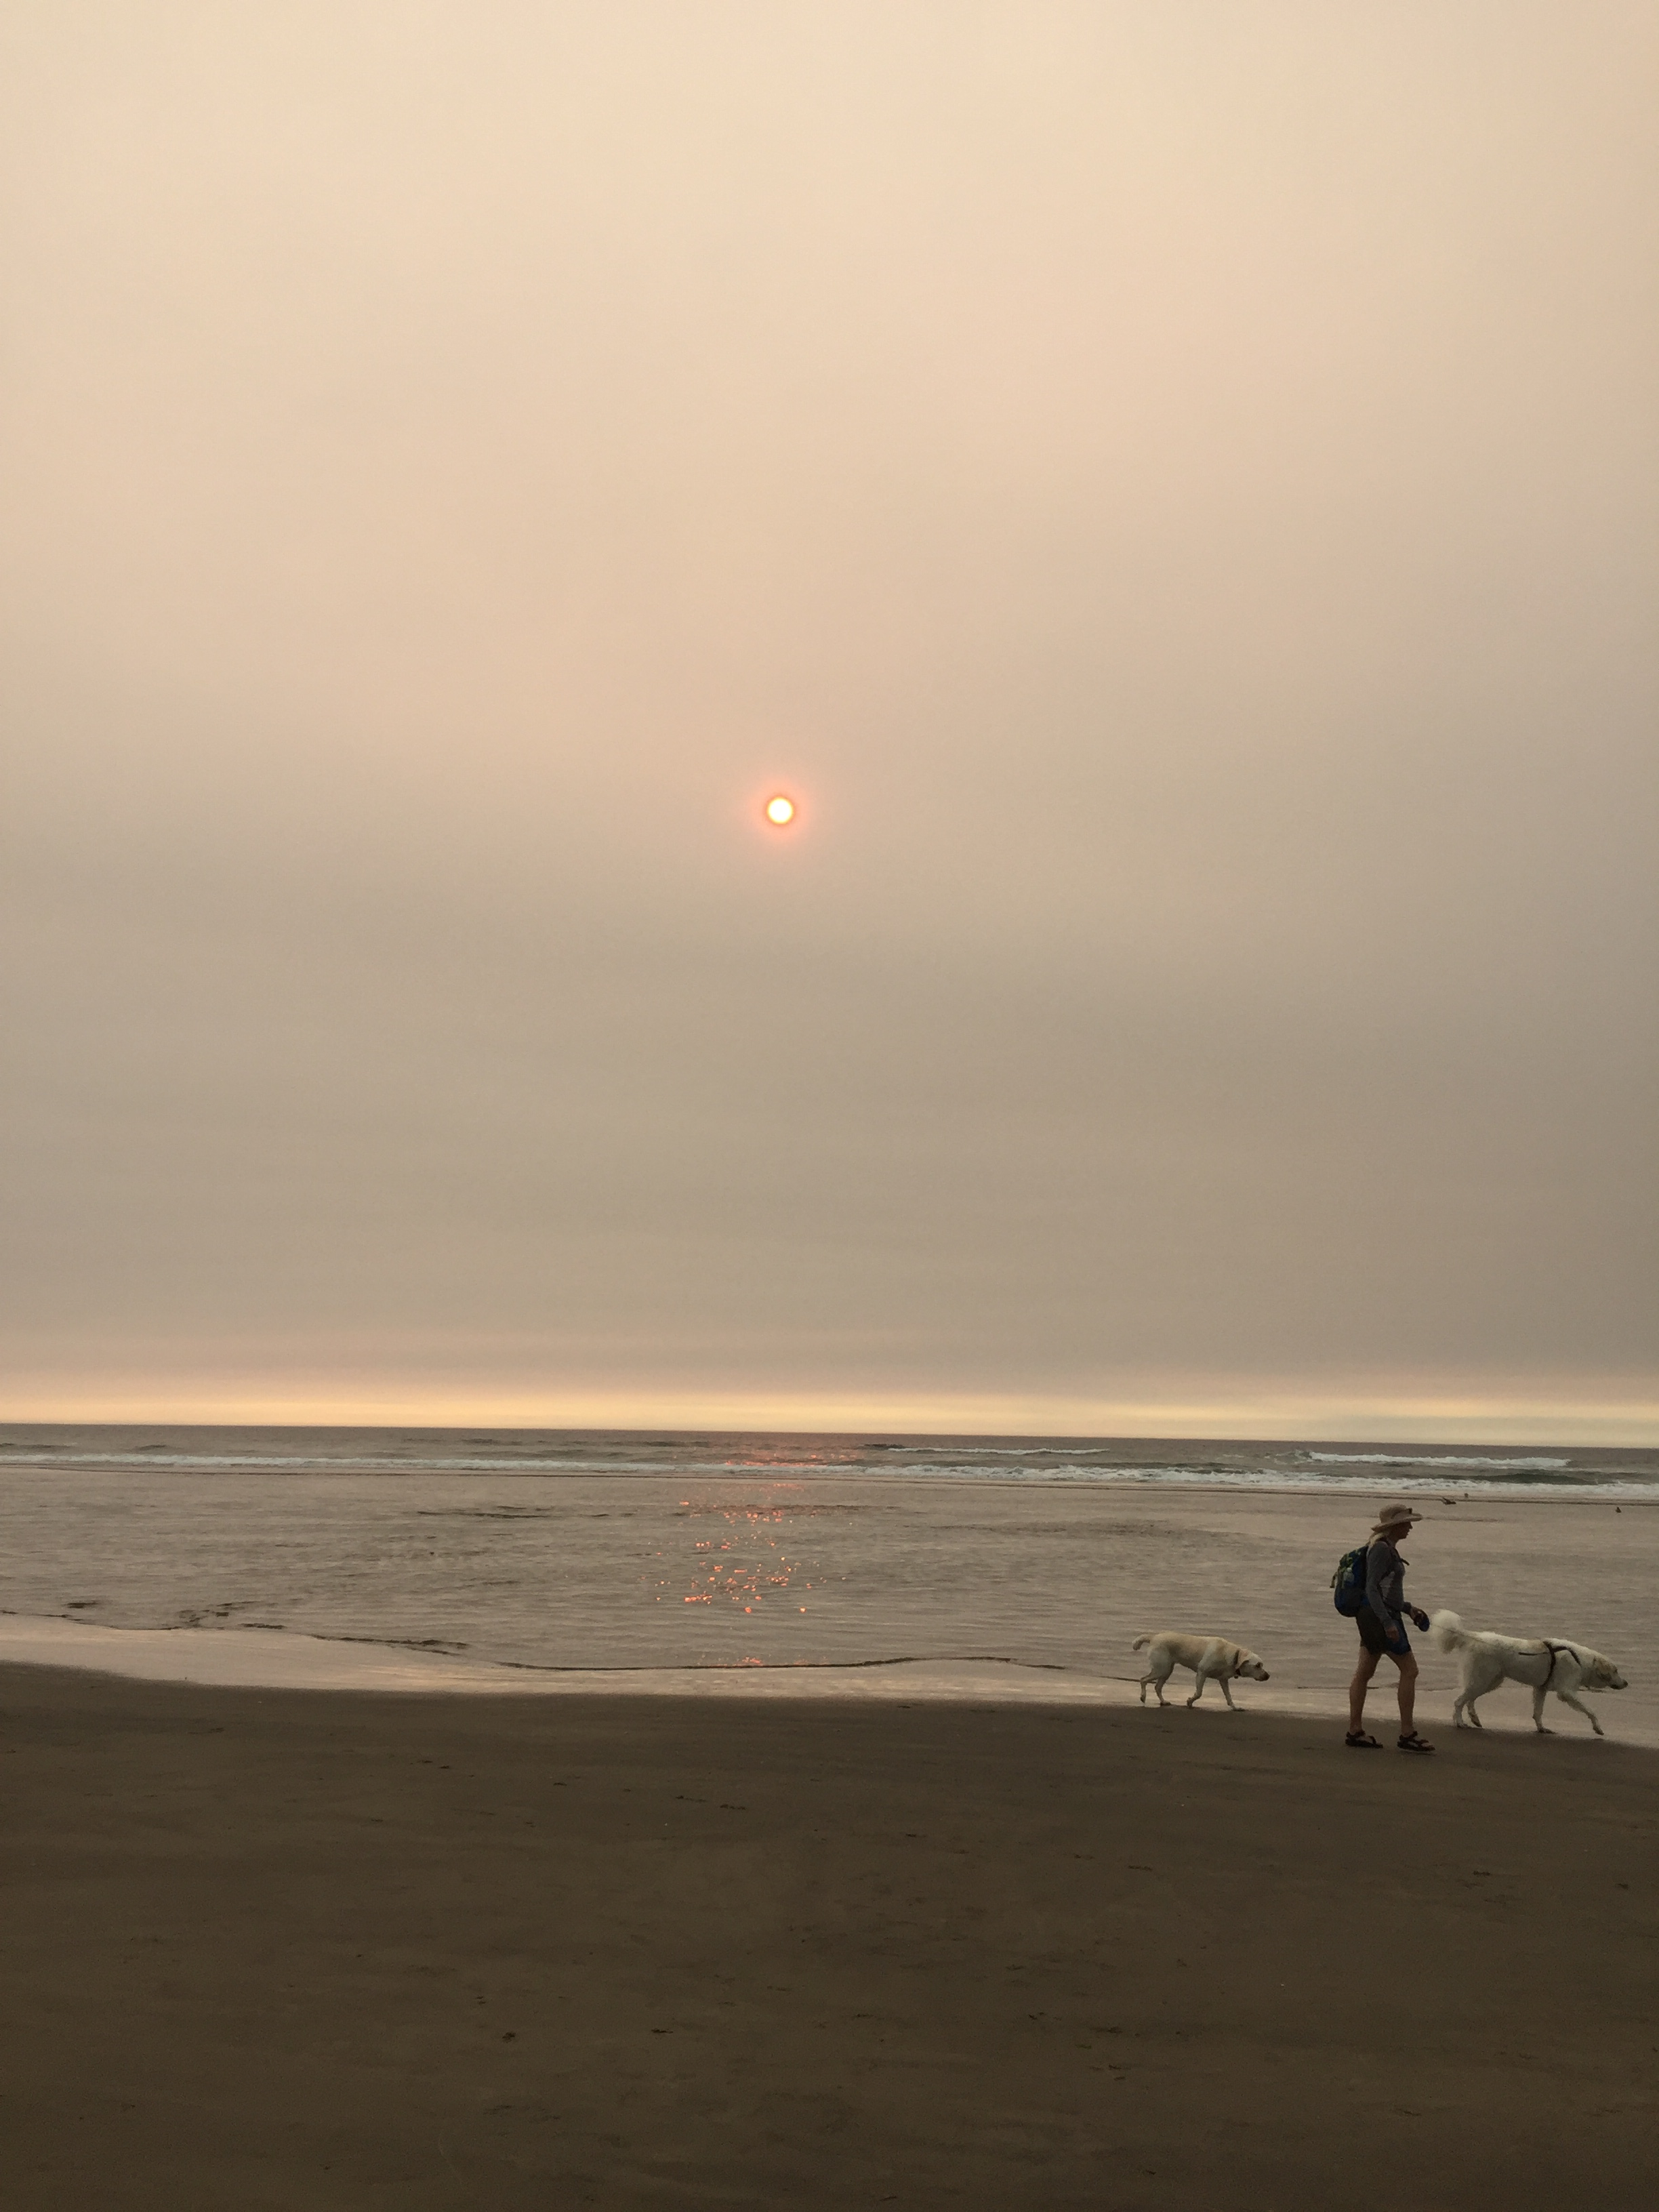 Oregon beach, hazy sun, person walking two dogs.